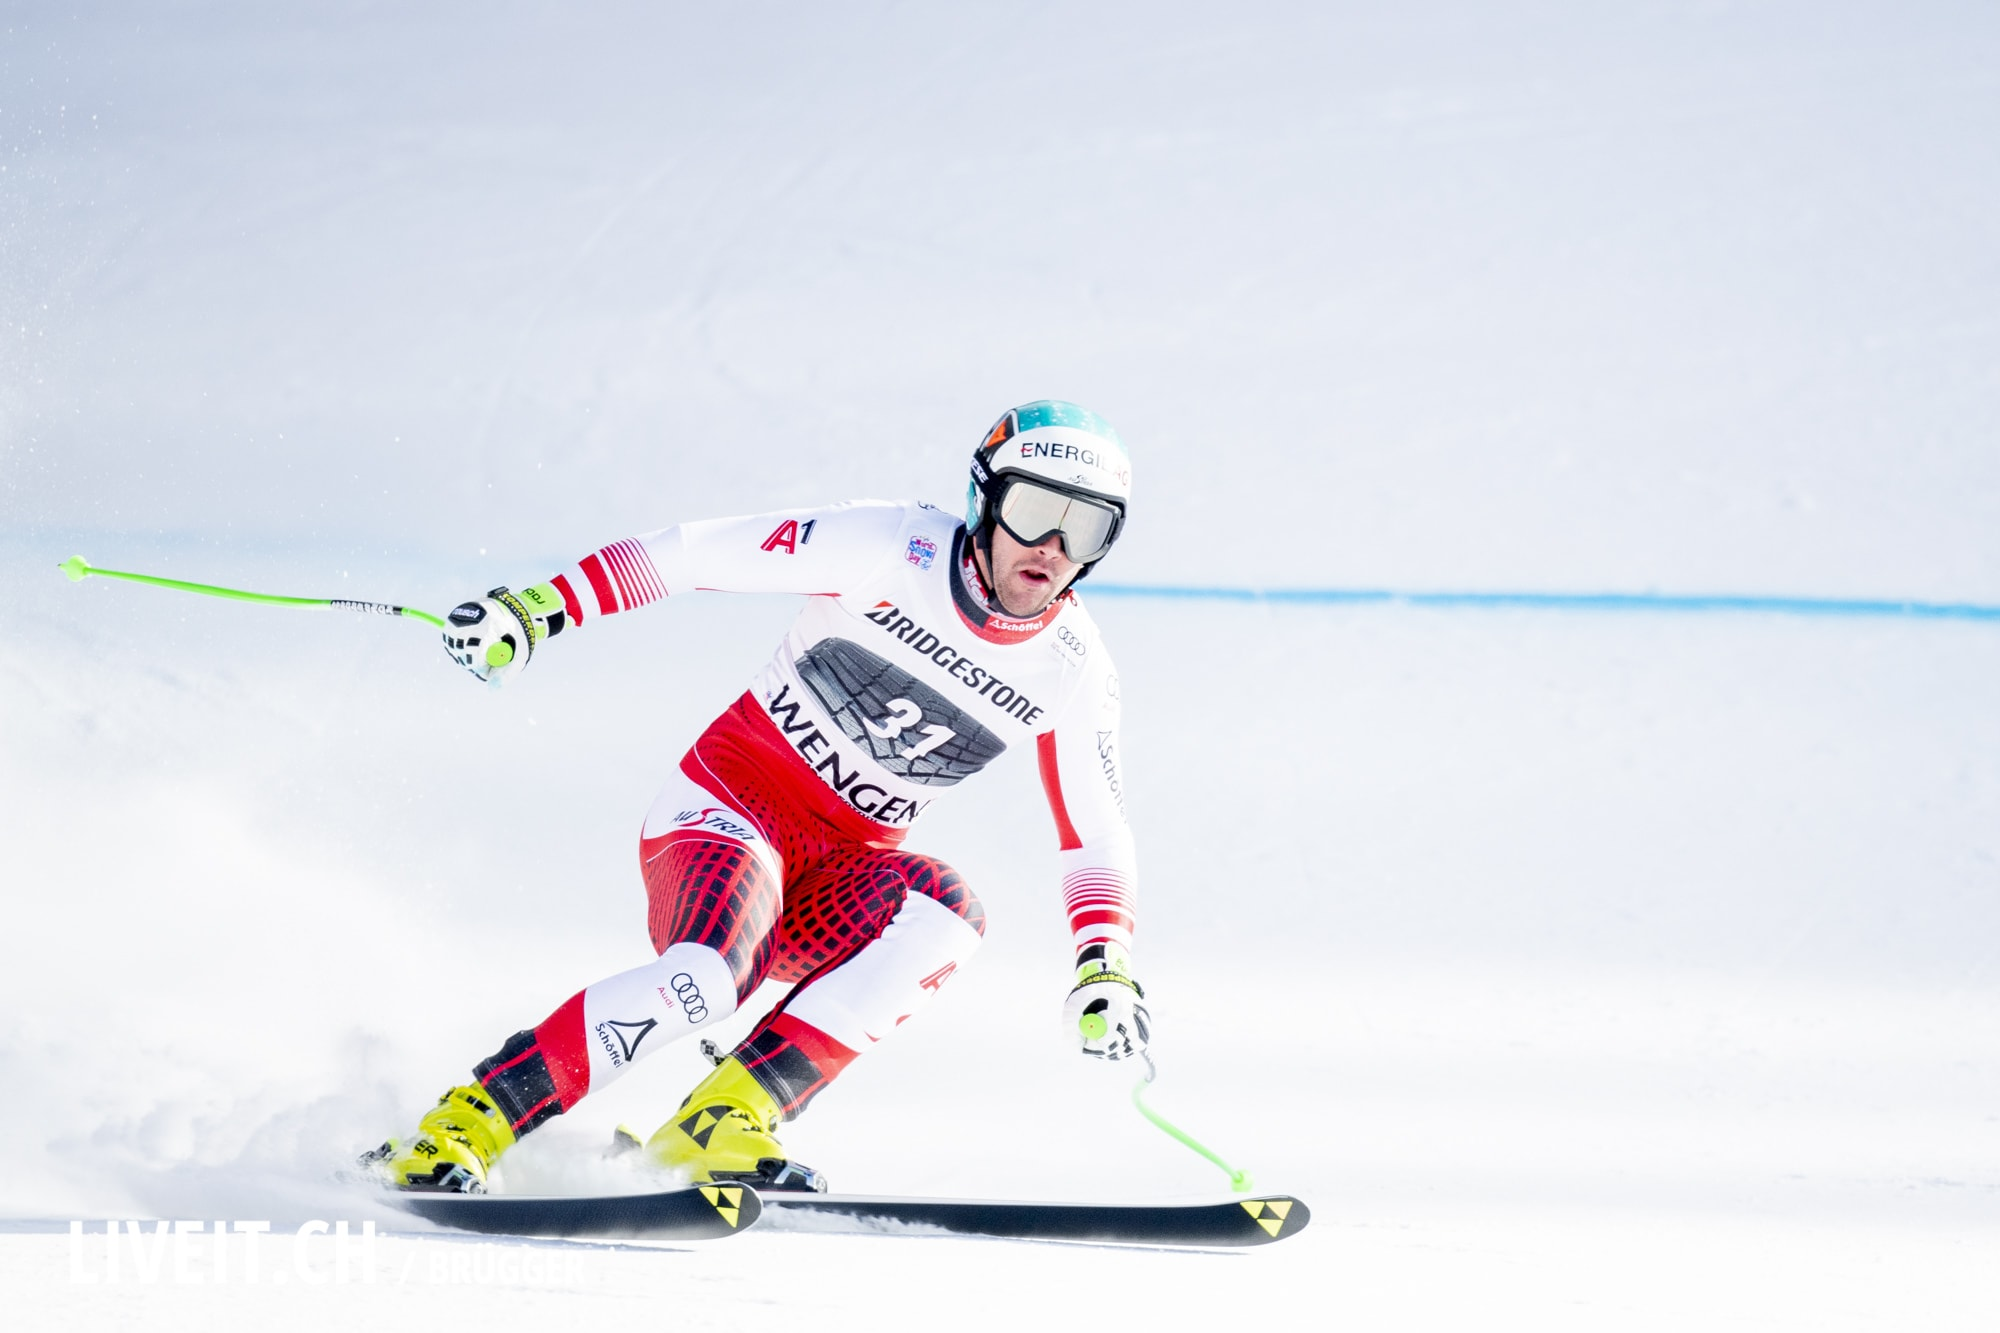 Vincent Kriechmayr (AUT) fotografiert am Freitag, 18. Januar 2019 am Lauberhornrennen in der Disziplin: Slalom Alpine Kombination. (Fotografiert von Dominic Bruegger liveit.ch)